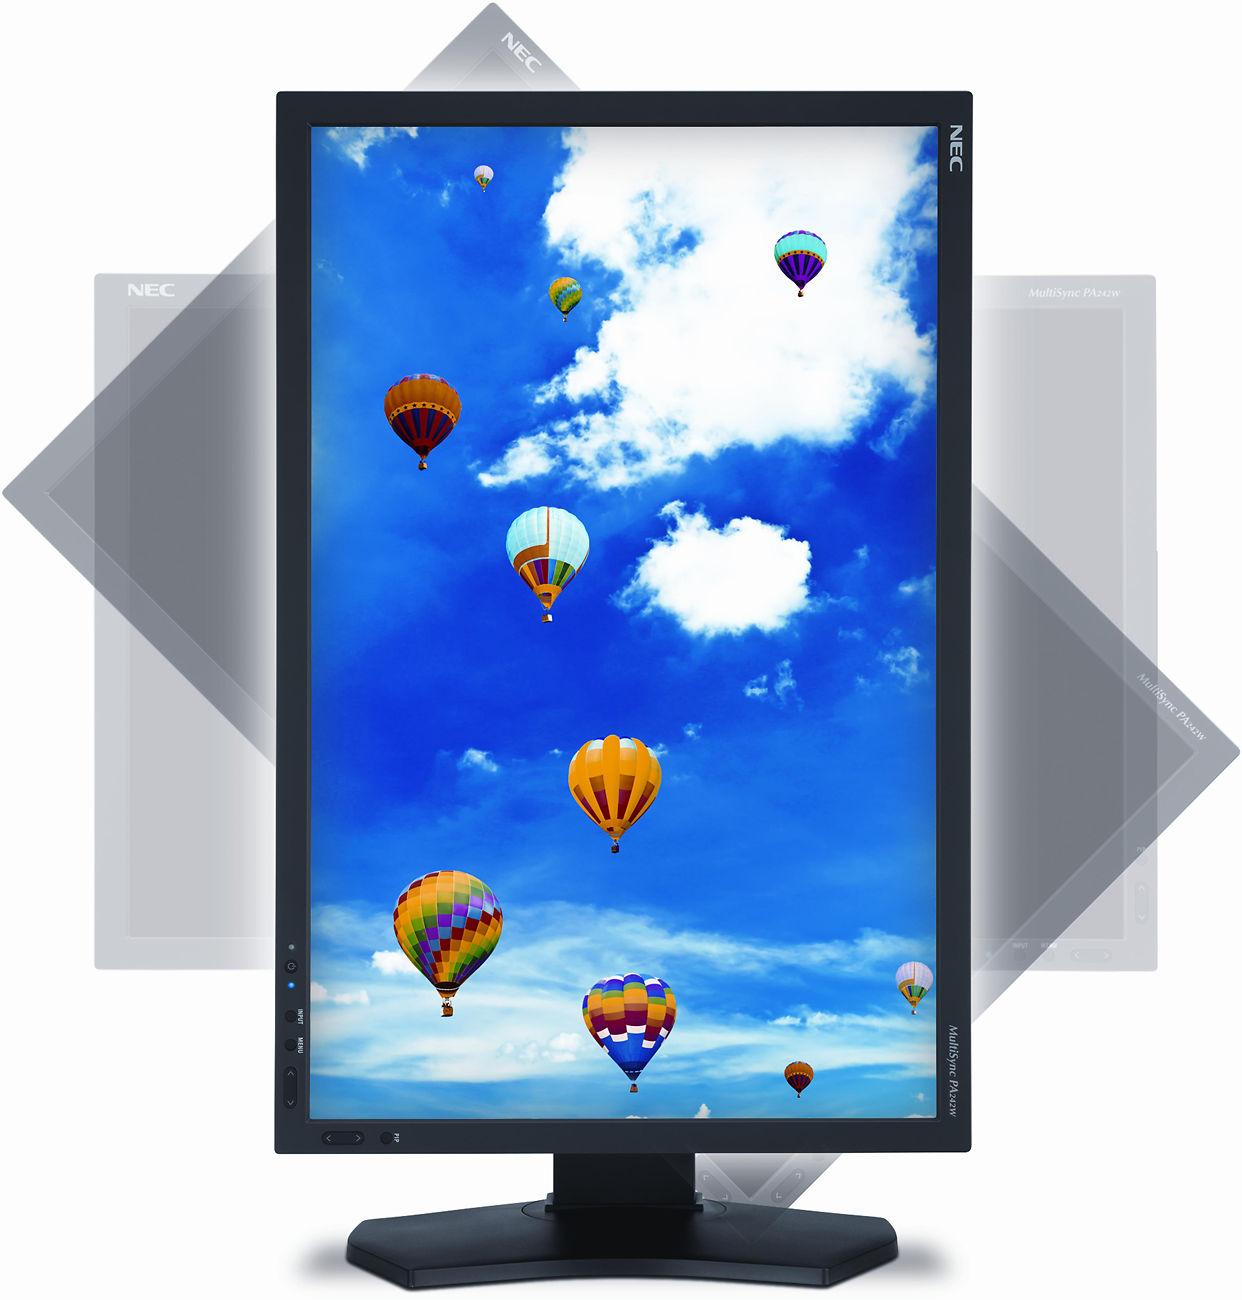 "NEC PA242W 24"" Monitor Image"